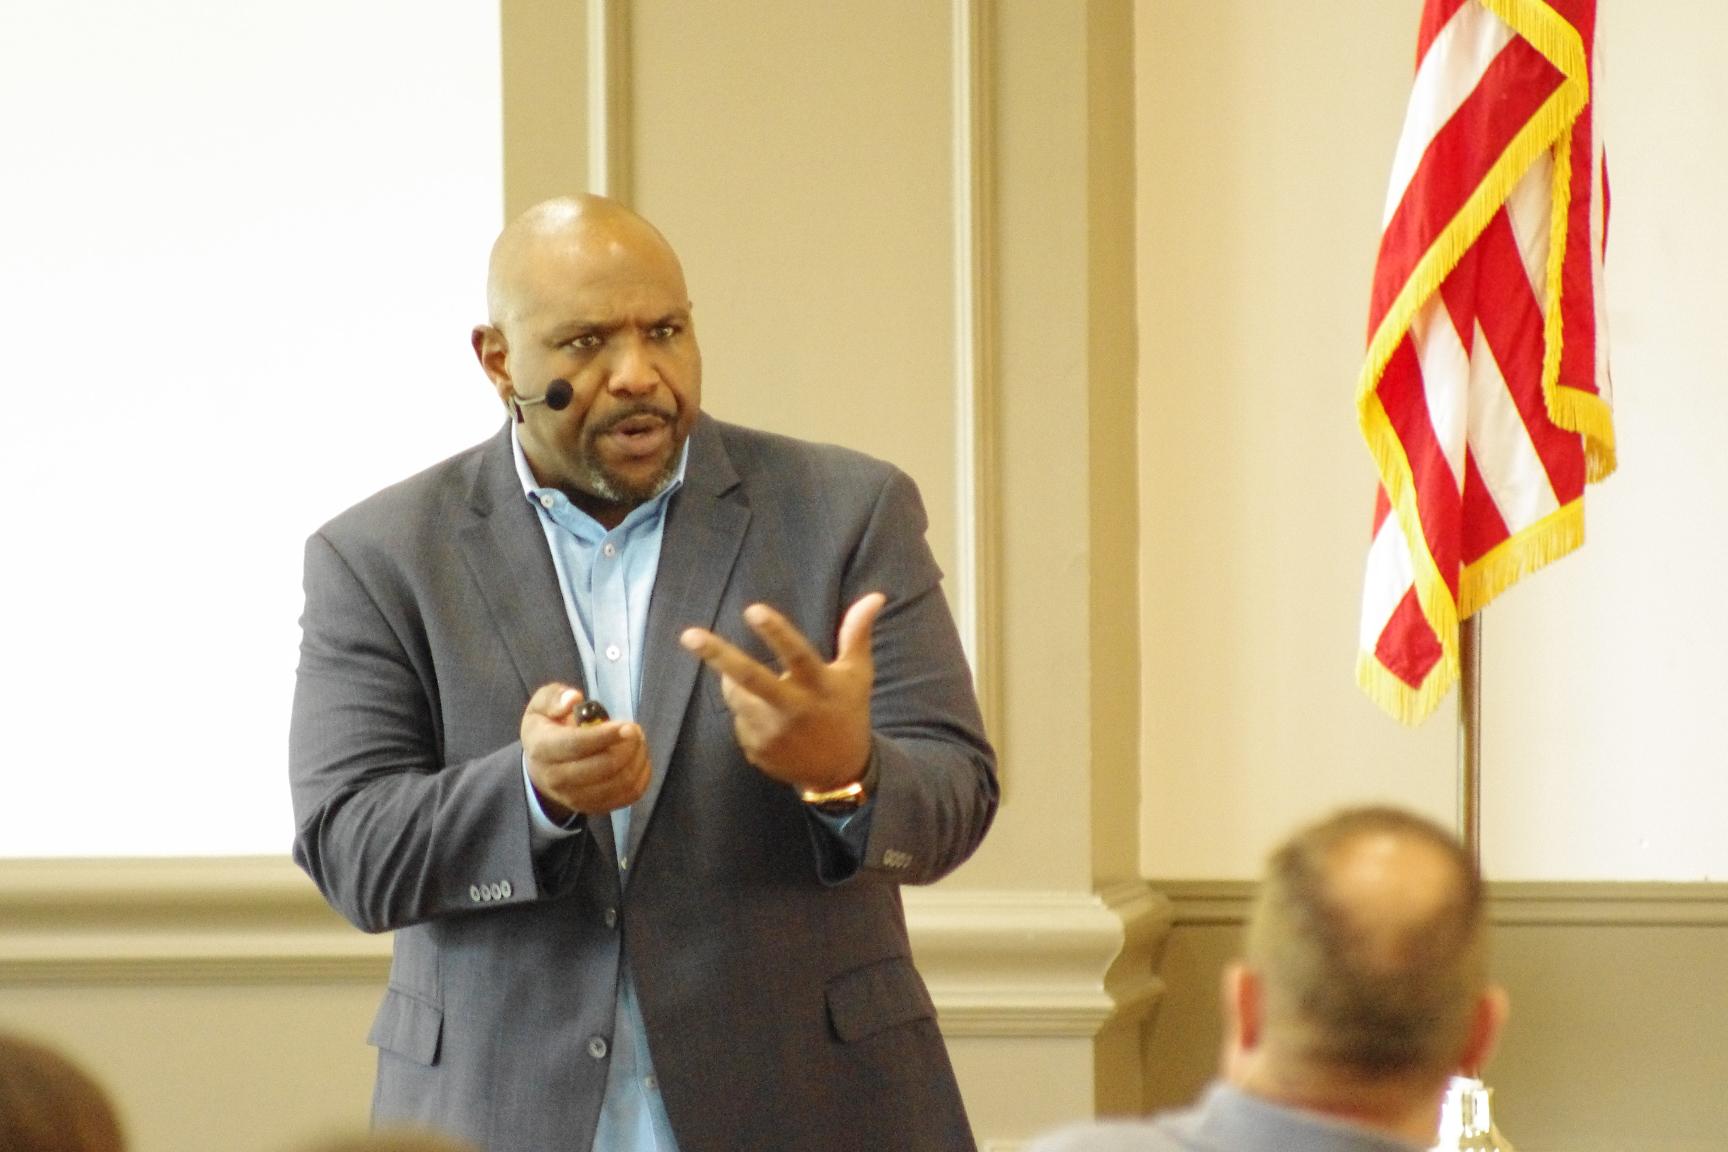 Chris Hogan of Dave Ramsey fame speaks on leadership in Spring Hill